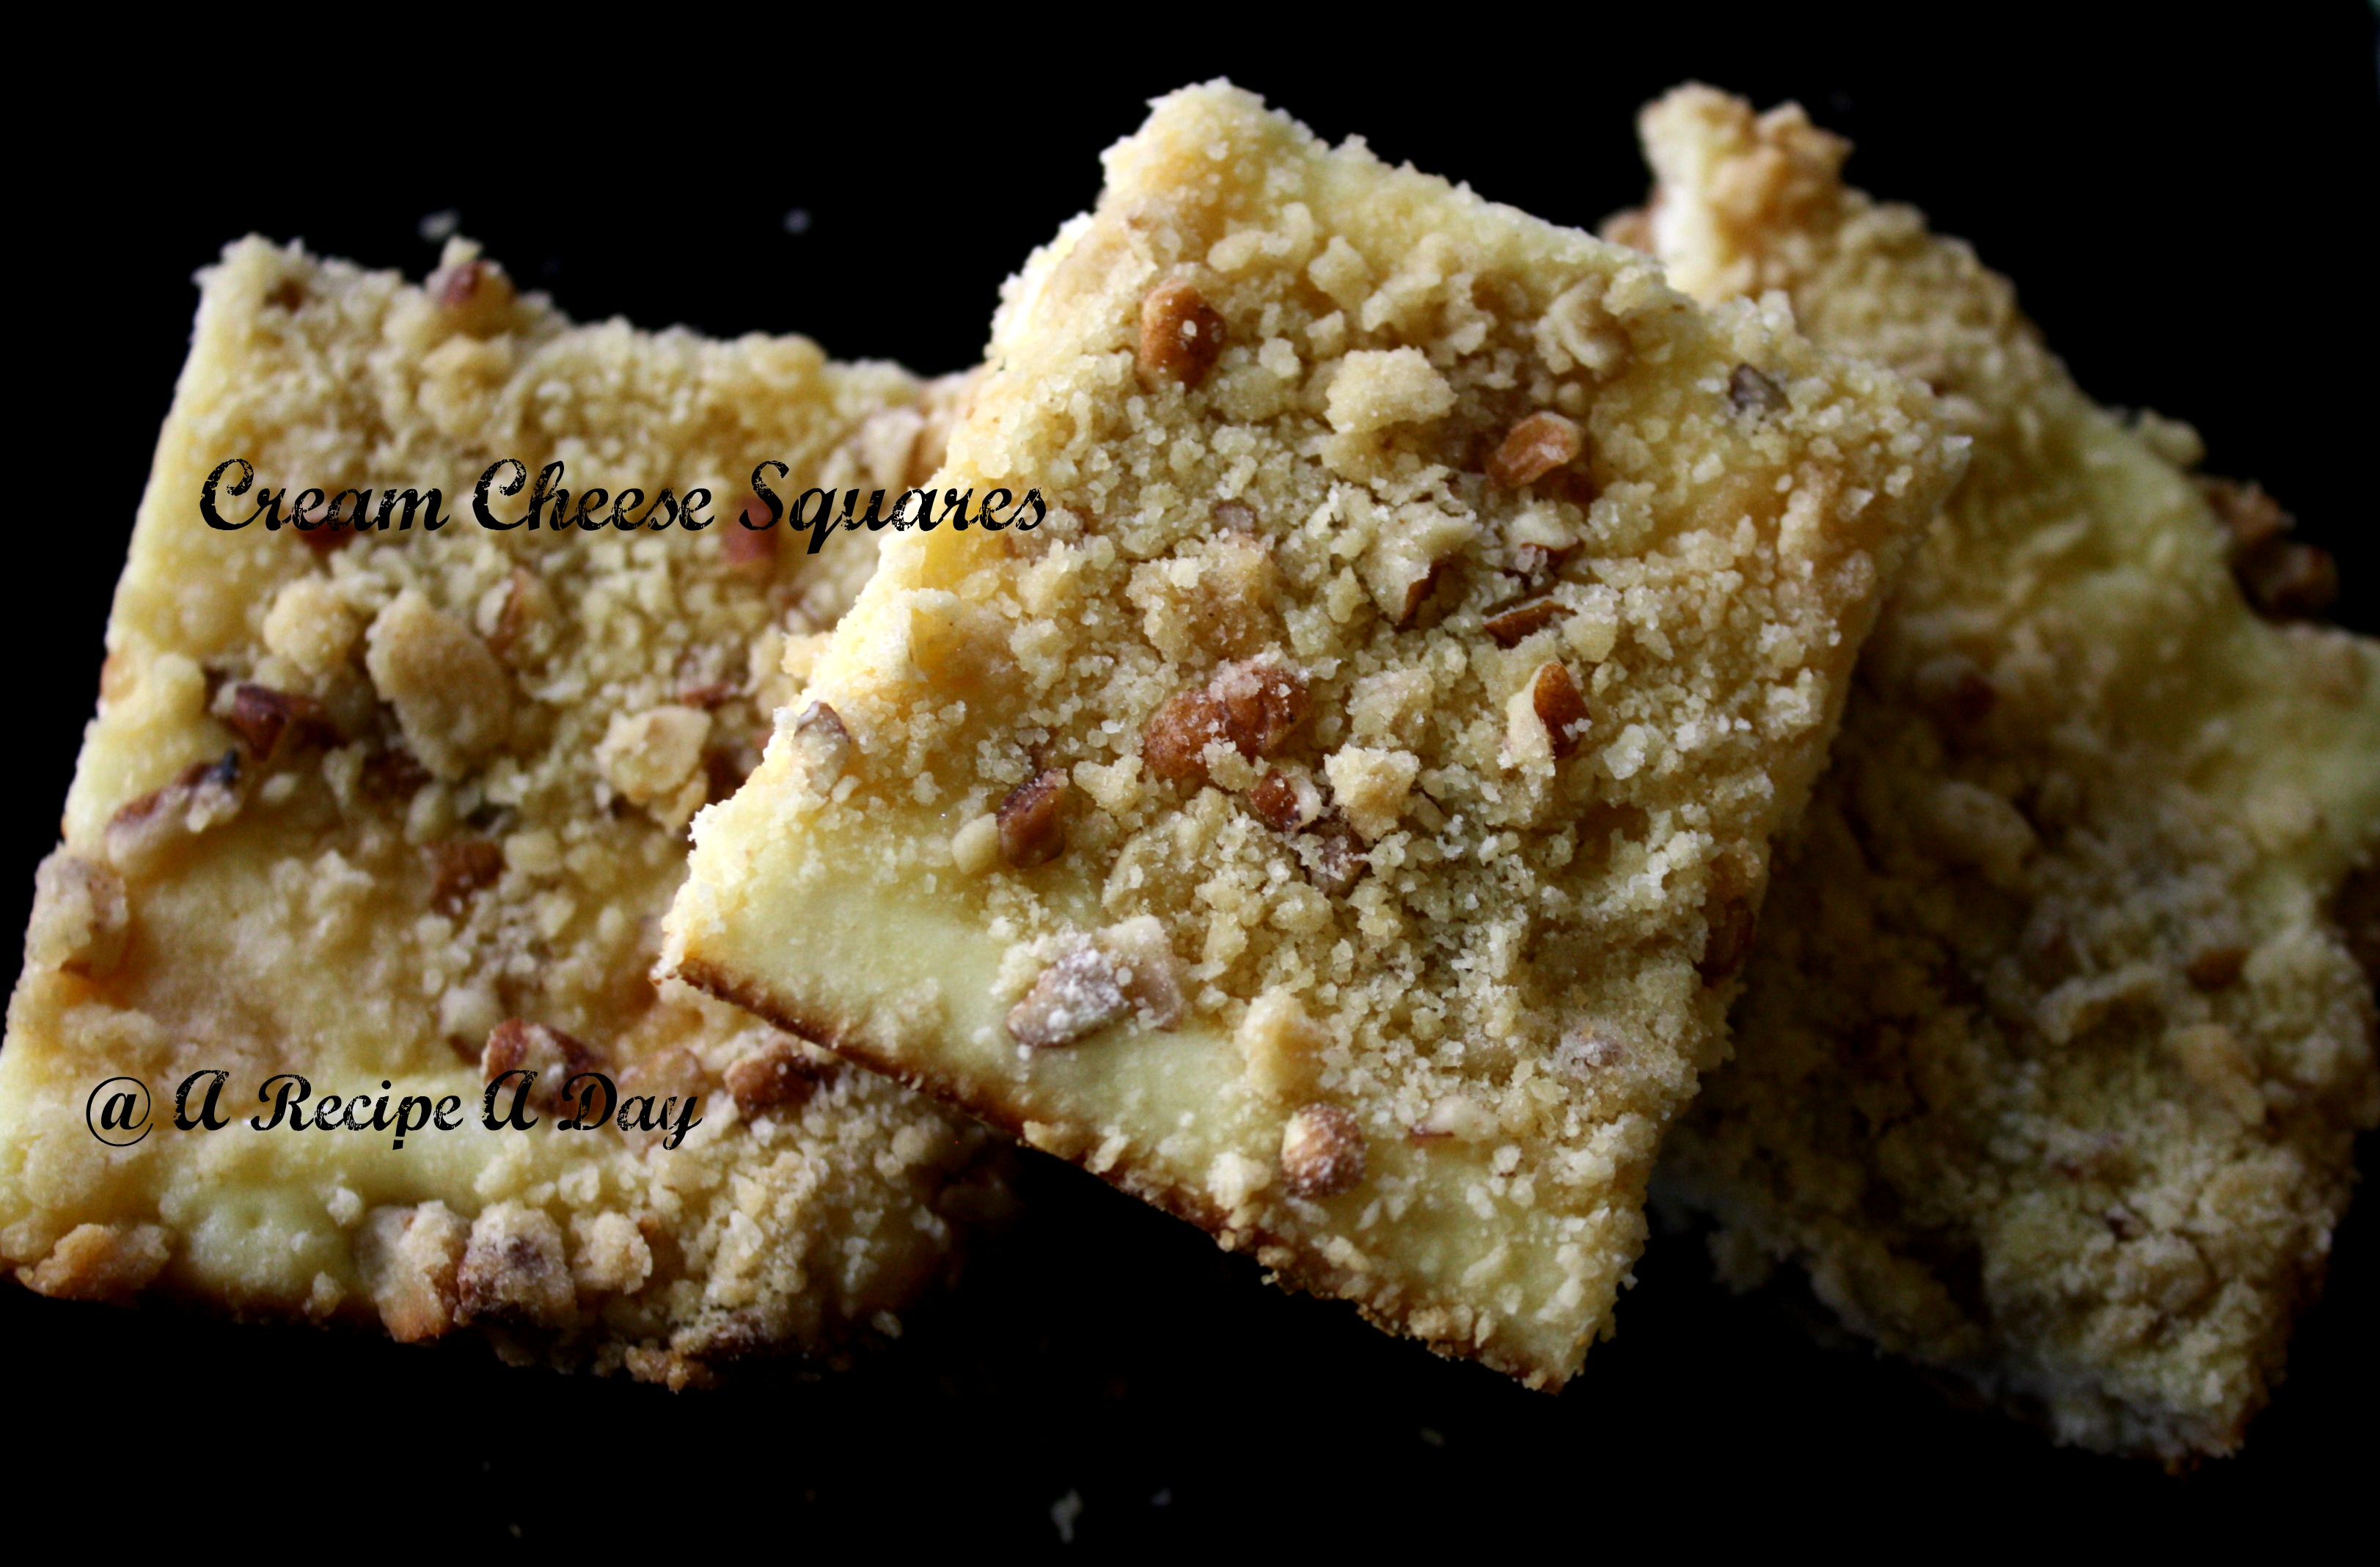 Vintage Recipes Series ~ Cream Cheese Squares